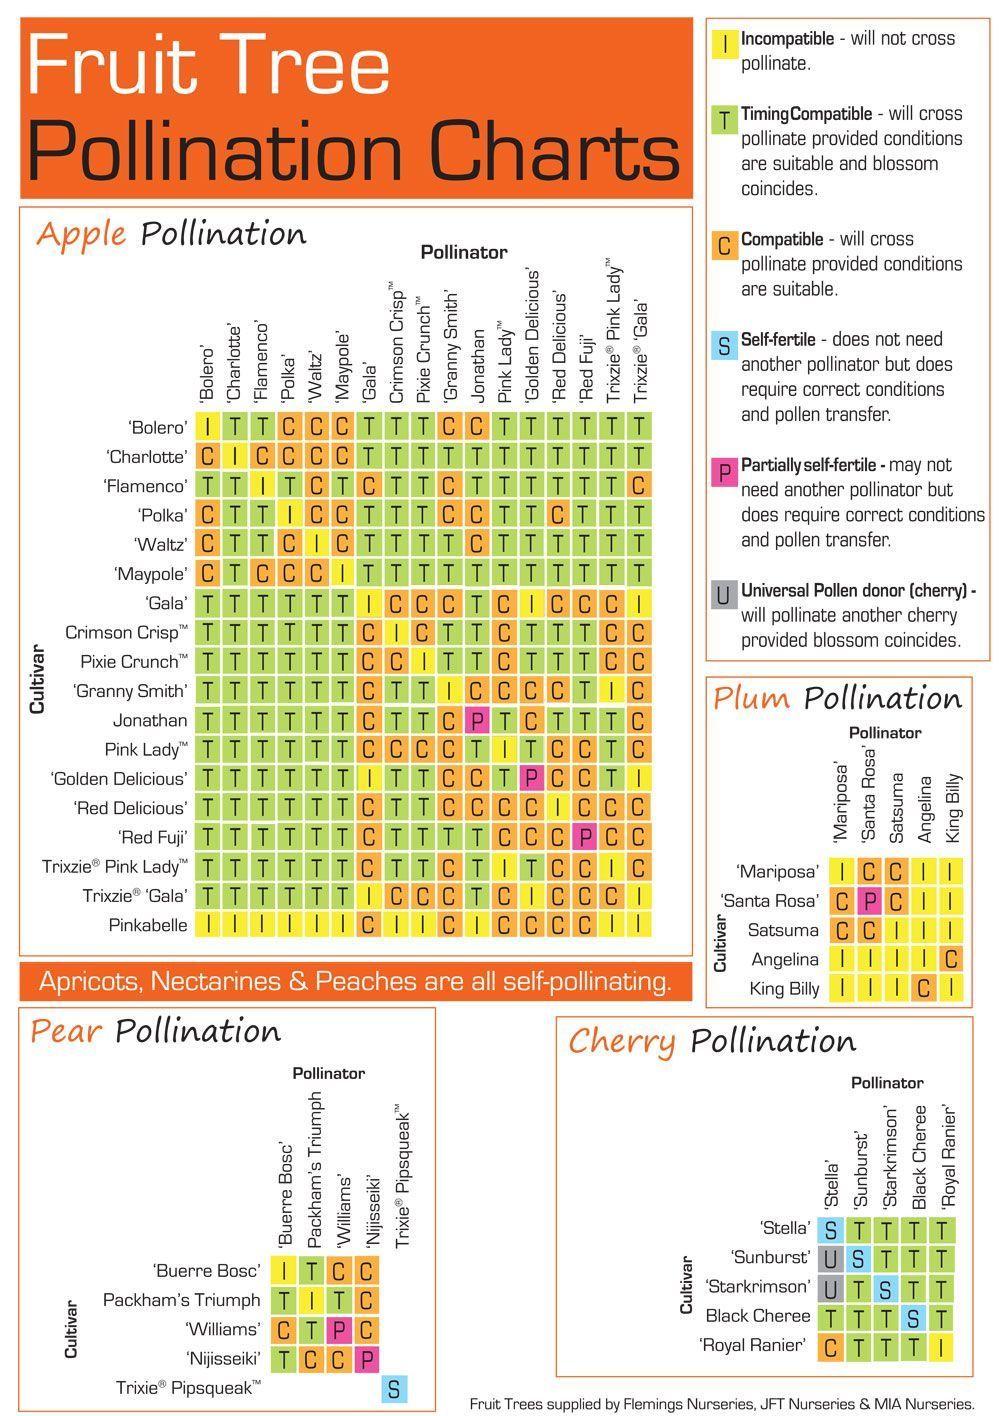 Pollination Fruit Treefruit Tree Pollination Fruit Trees Pollination Growing Fruit Trees